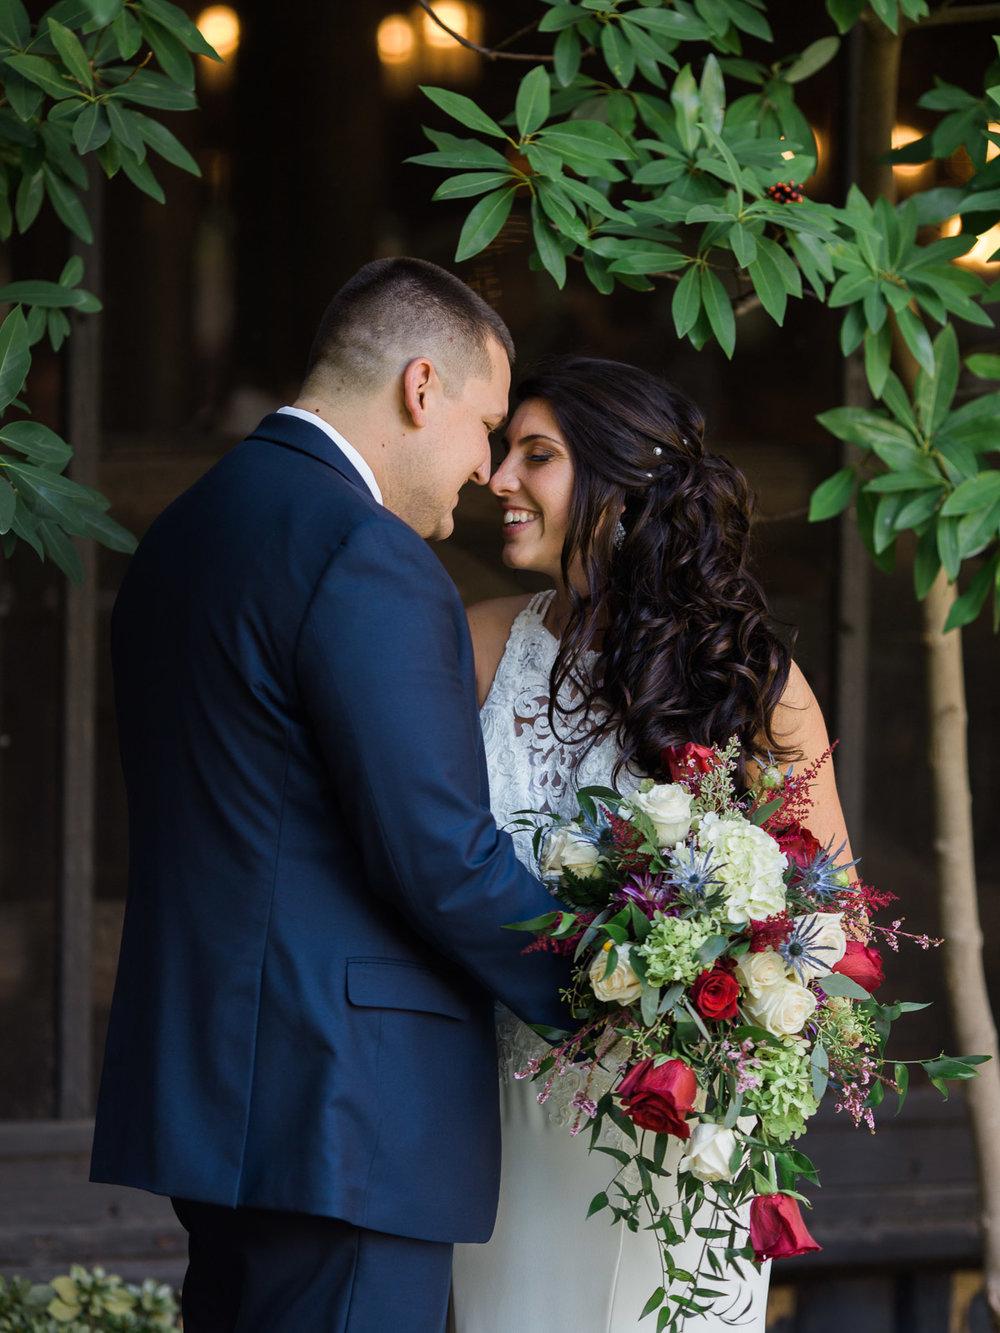 elegant-hoover-hall-wedding-photos-by-matt-erickson-photography-10.jpg